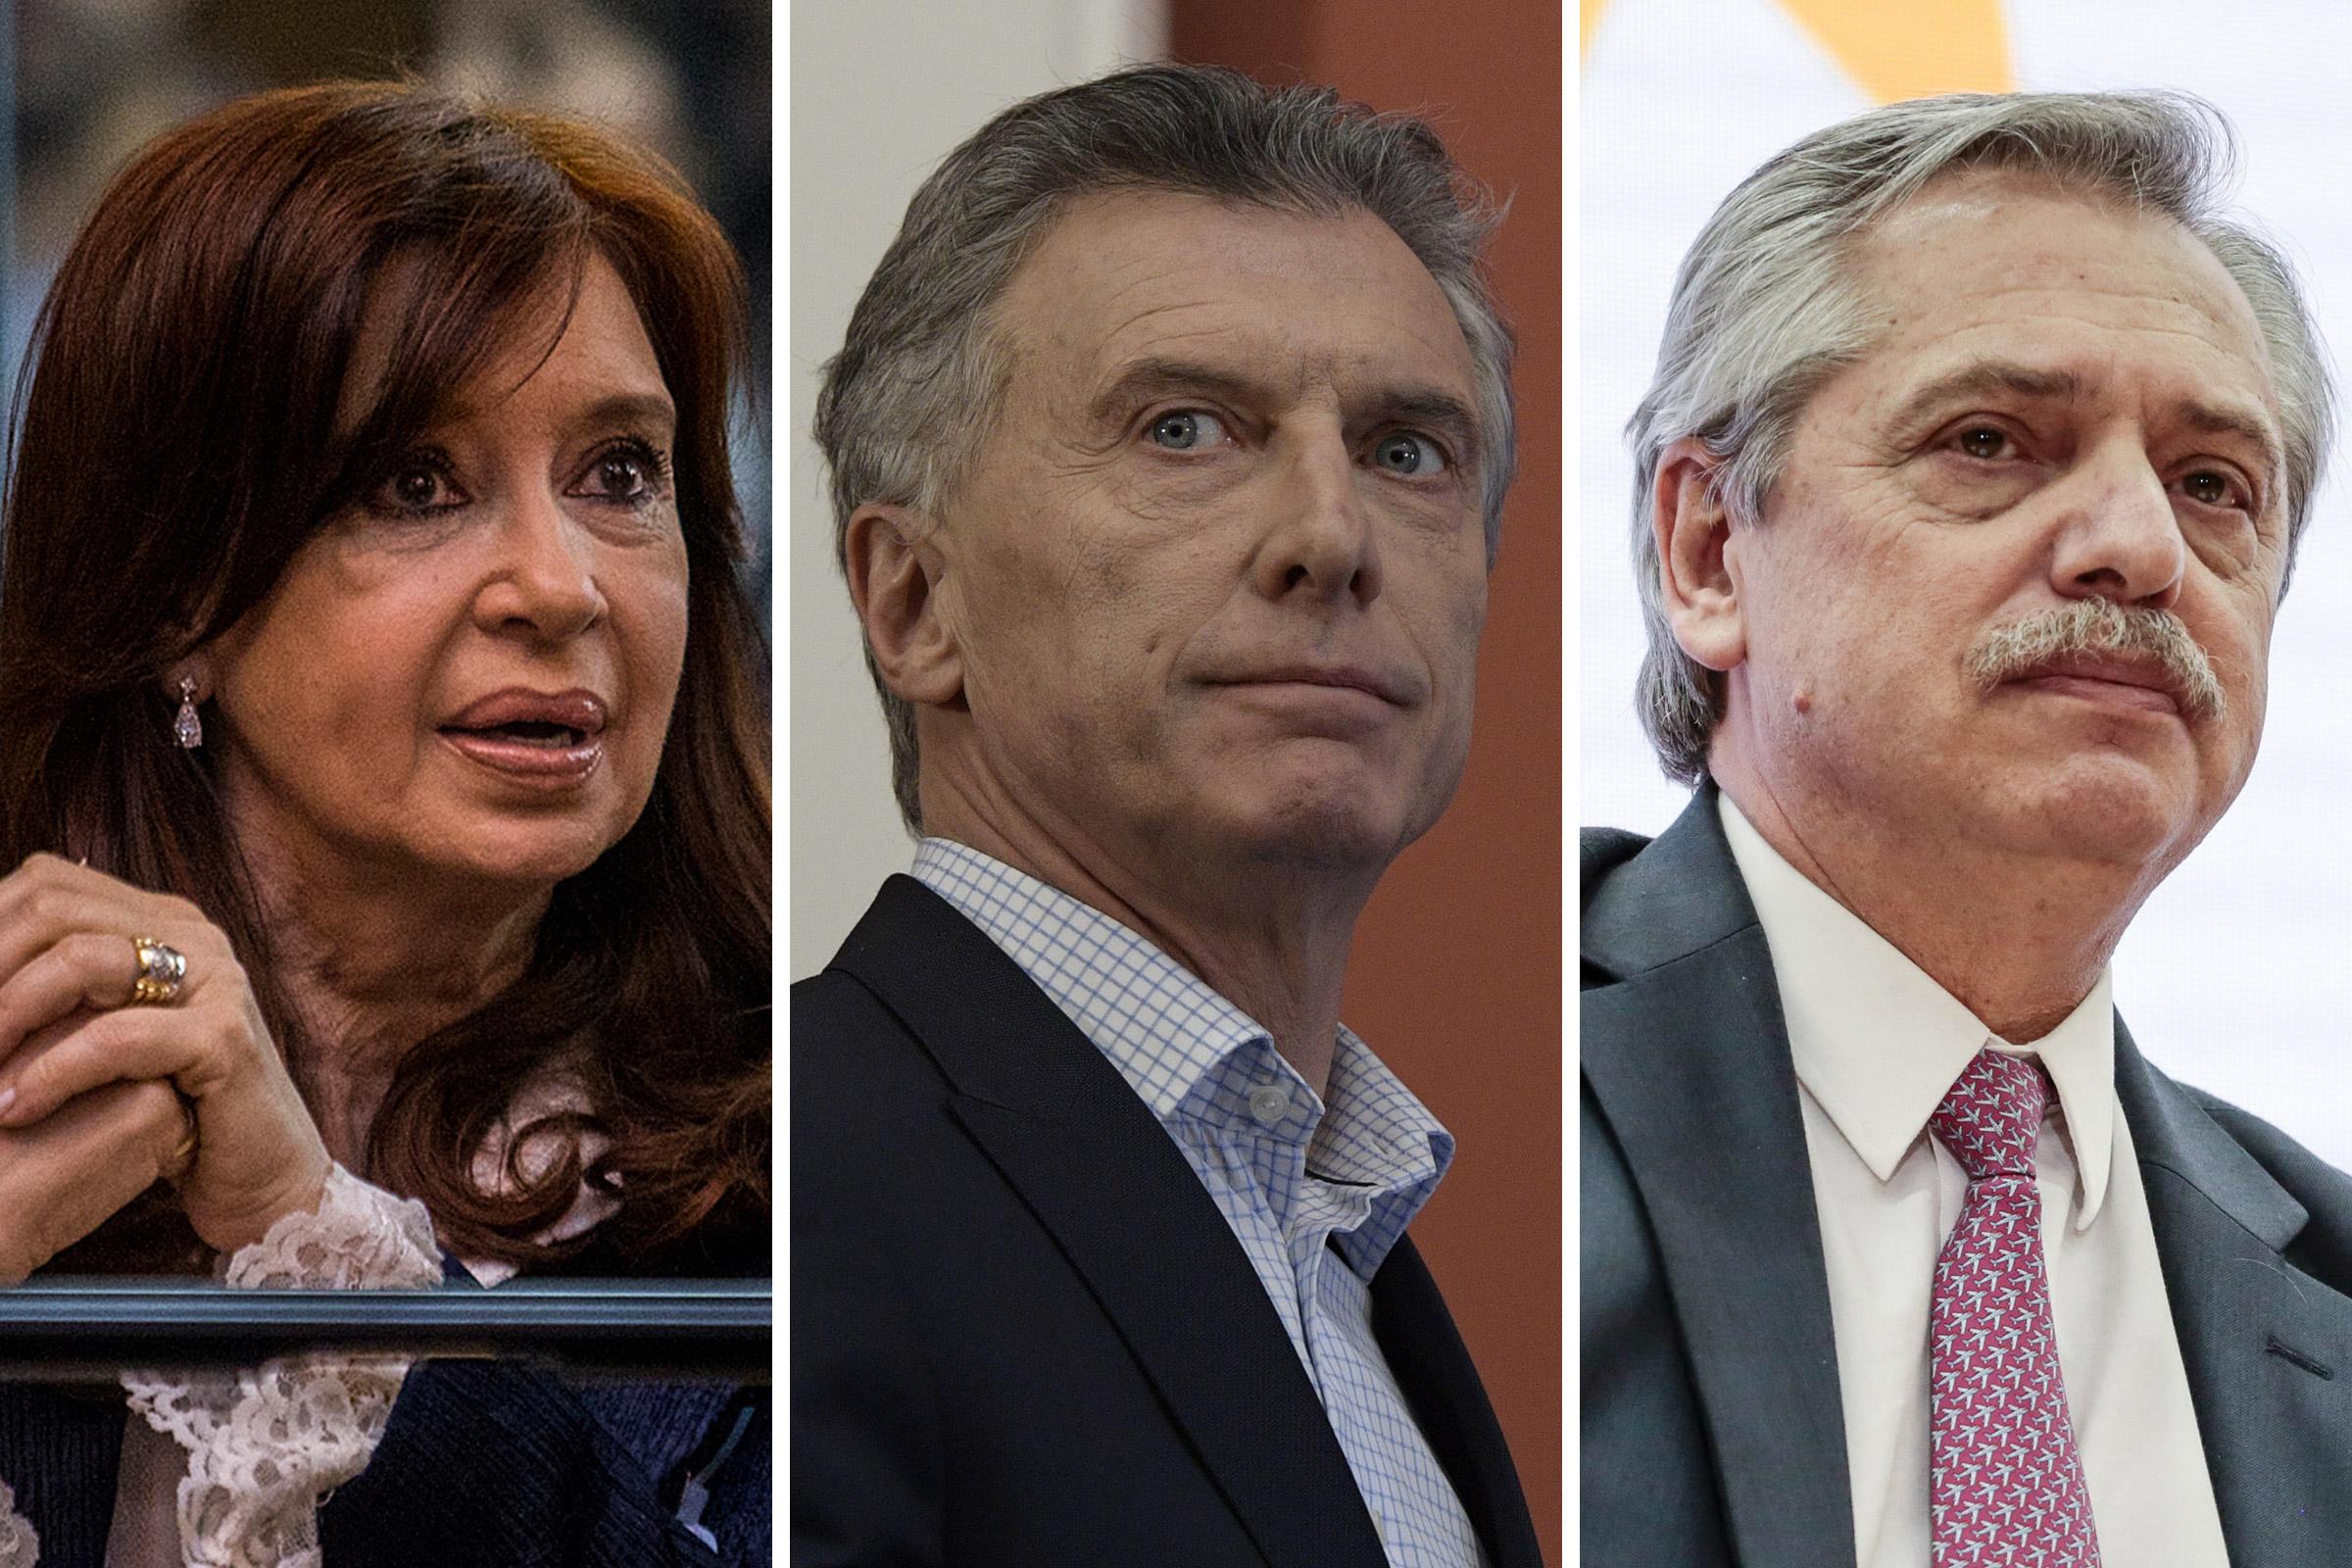 Former President and current Senator Cristina Fernandez; Argentina's President Mauricio Macri; Alberto Fernandez, presidential candidate for the Frente de Todos electoral coalition.